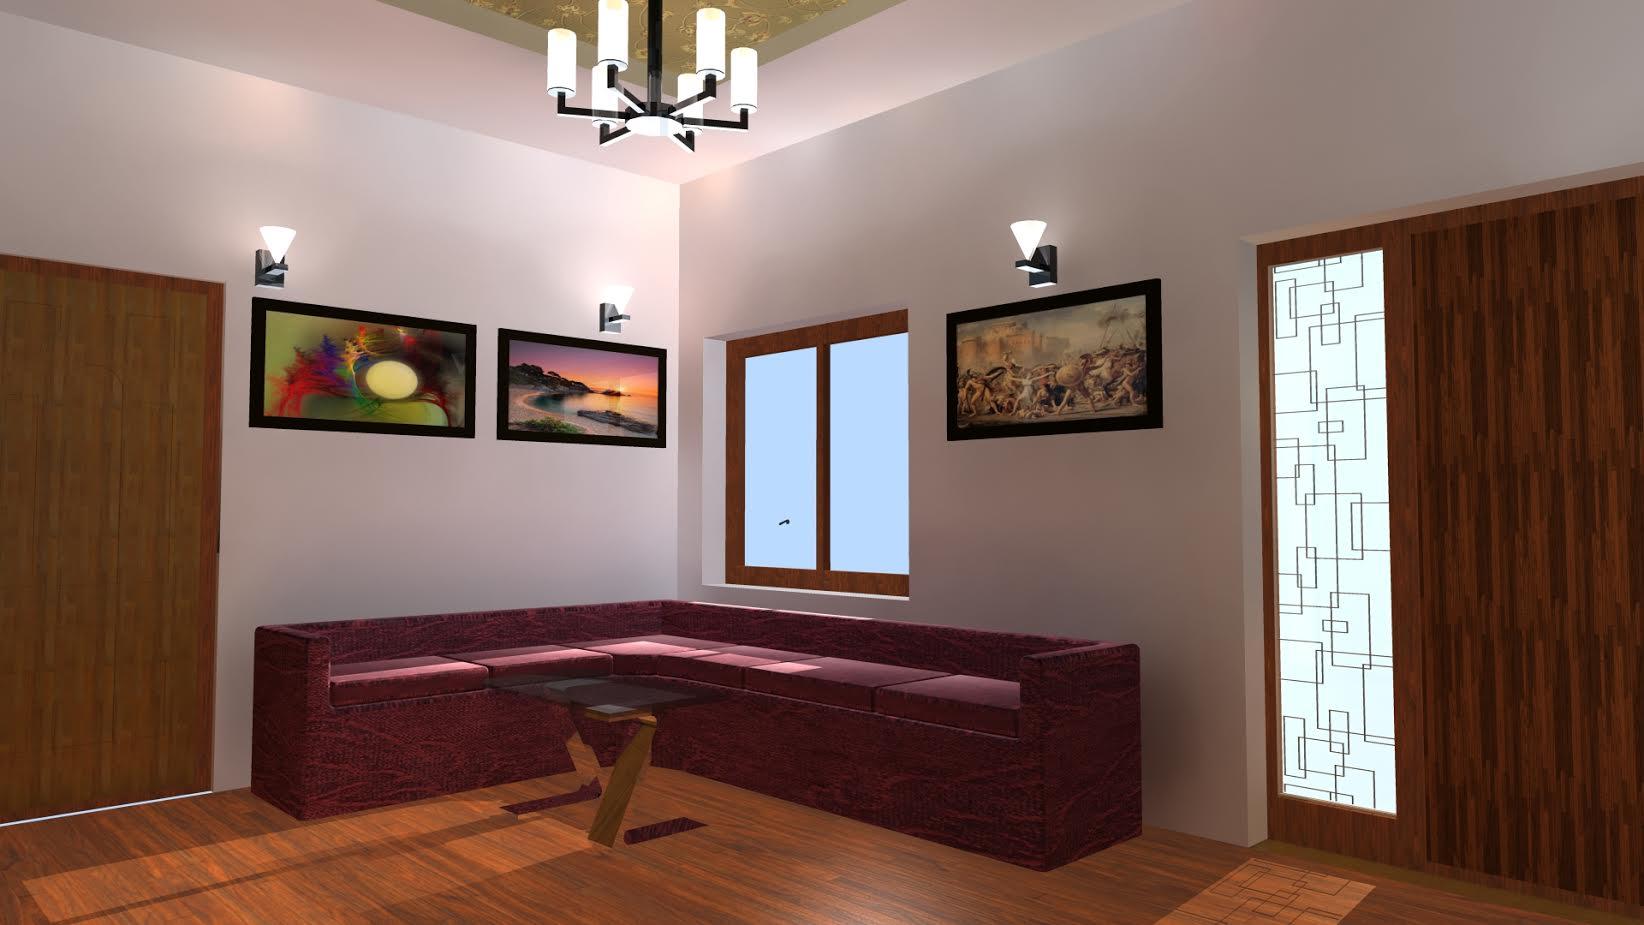 3d interior designs kr eco solutions for 3d interior design online